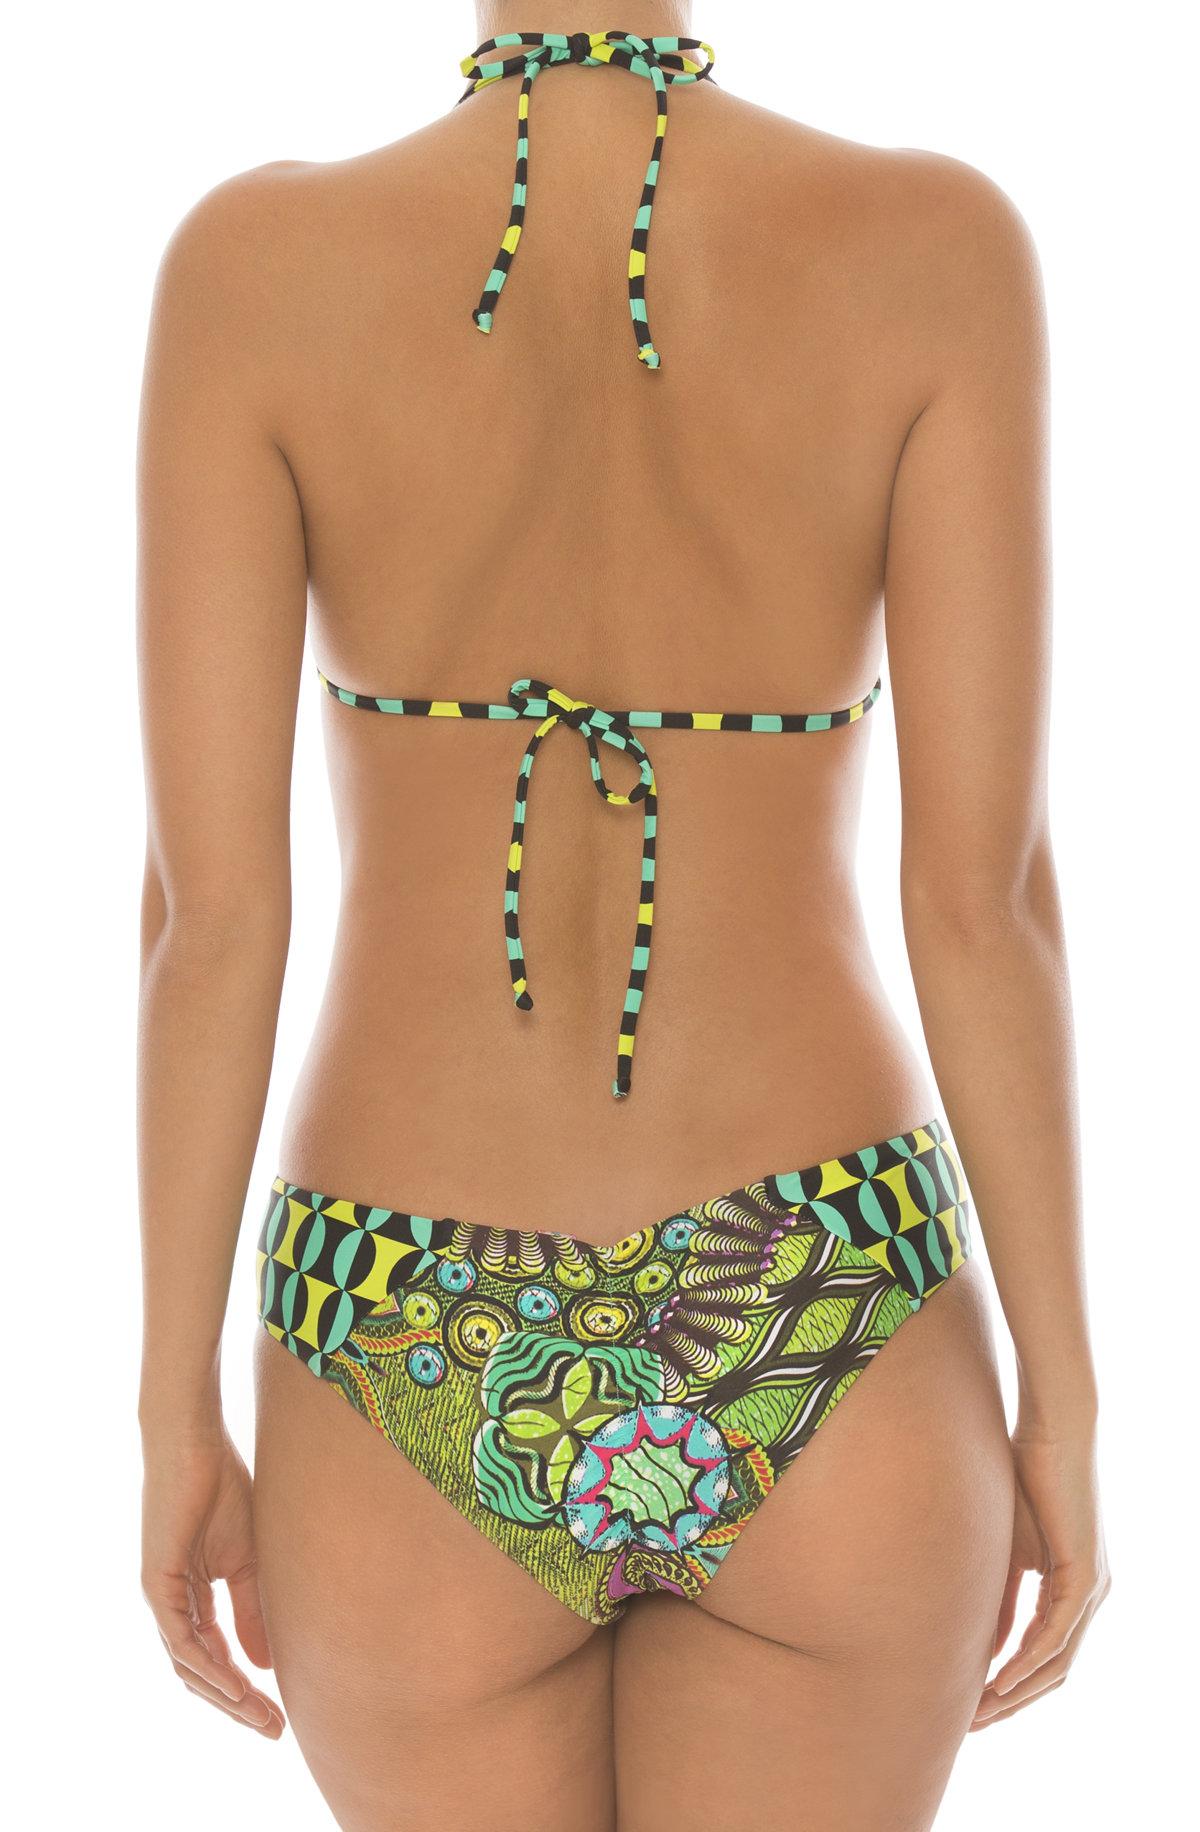 Paradizia Swimwear: Pink Martini Cutout Monokini (1 Left!)